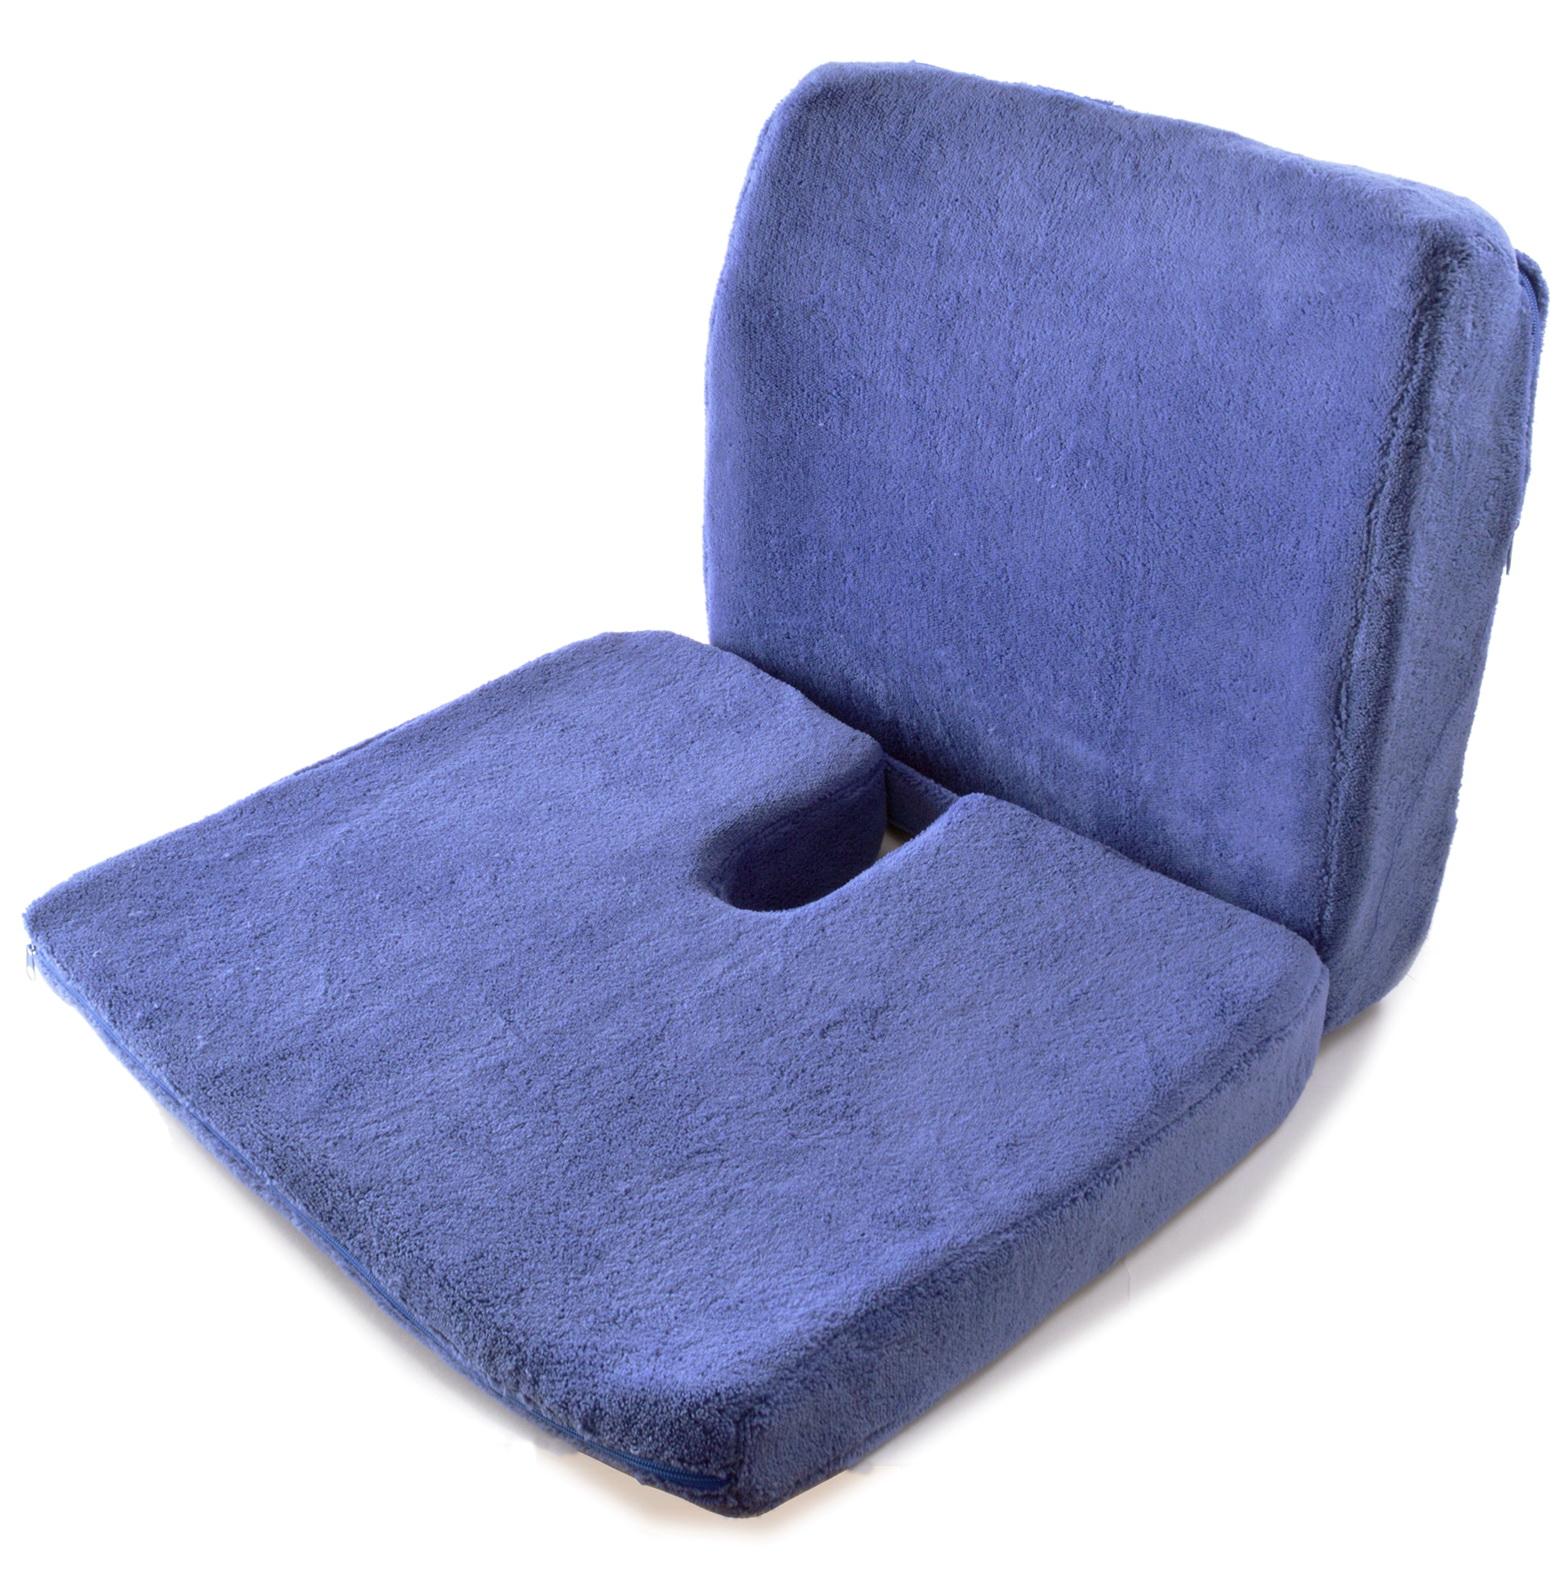 Cushion For Car Seat Back Pain